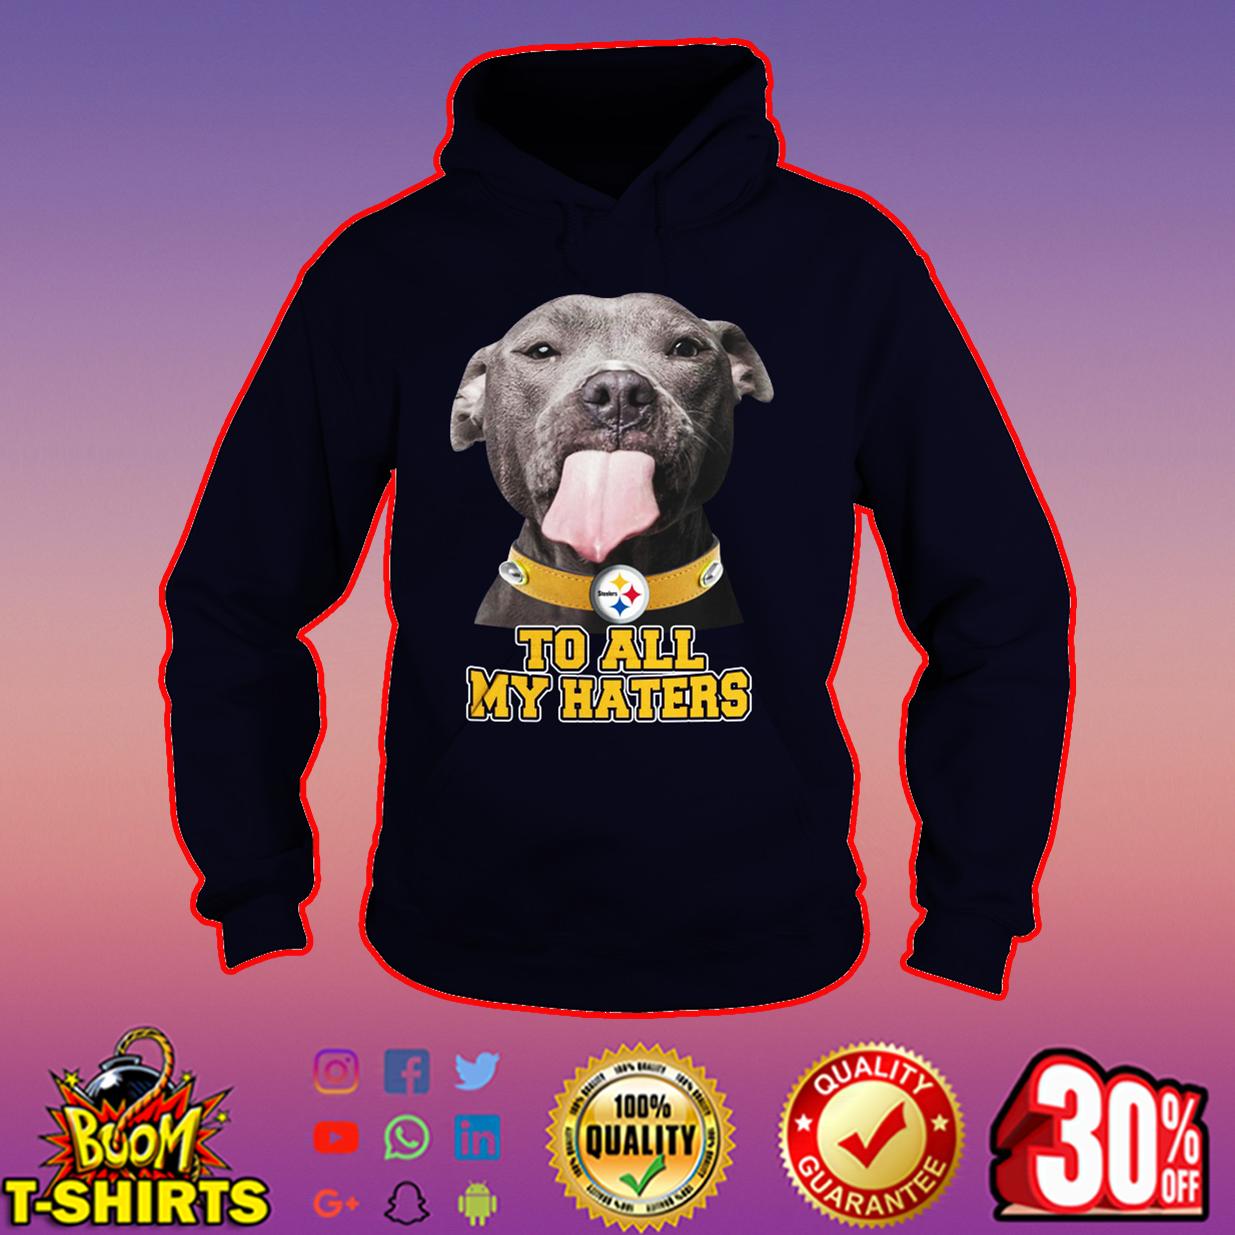 Pitbull Steelers too all my haters hoodie